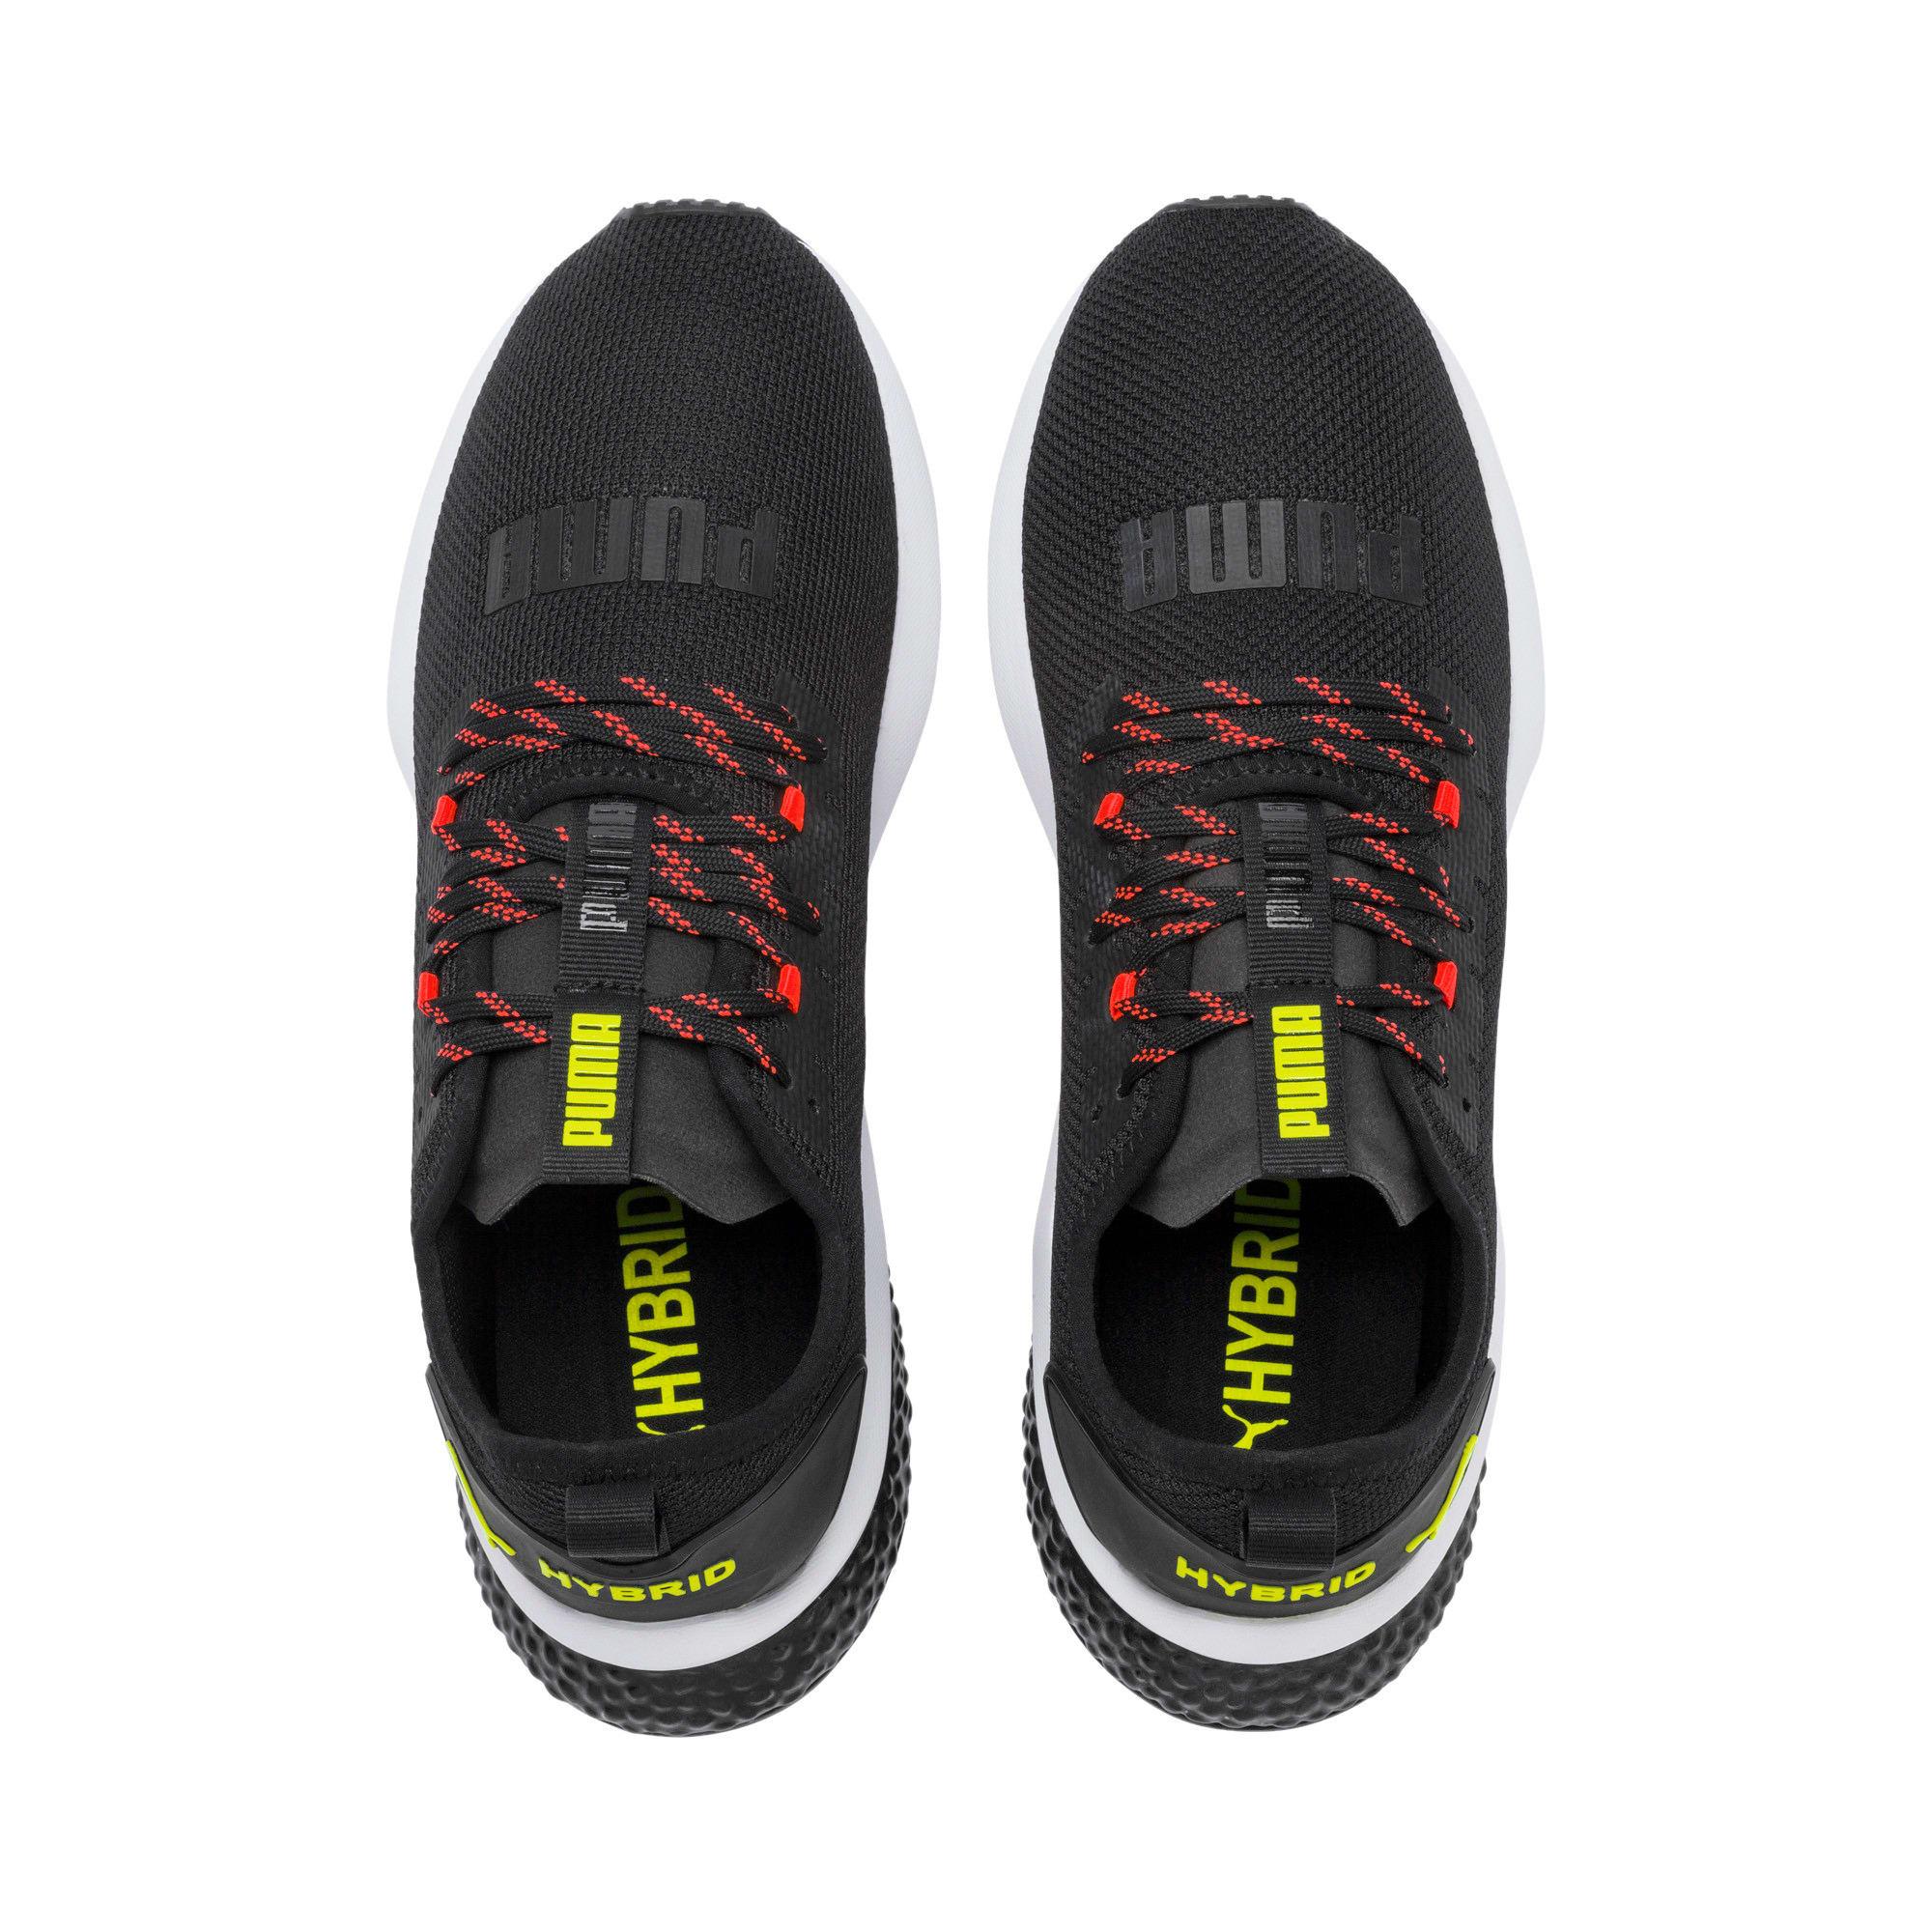 Thumbnail 7 of HYBRID NX Men's Running Shoes, Black-Nrgy Red-Yellow Alert, medium